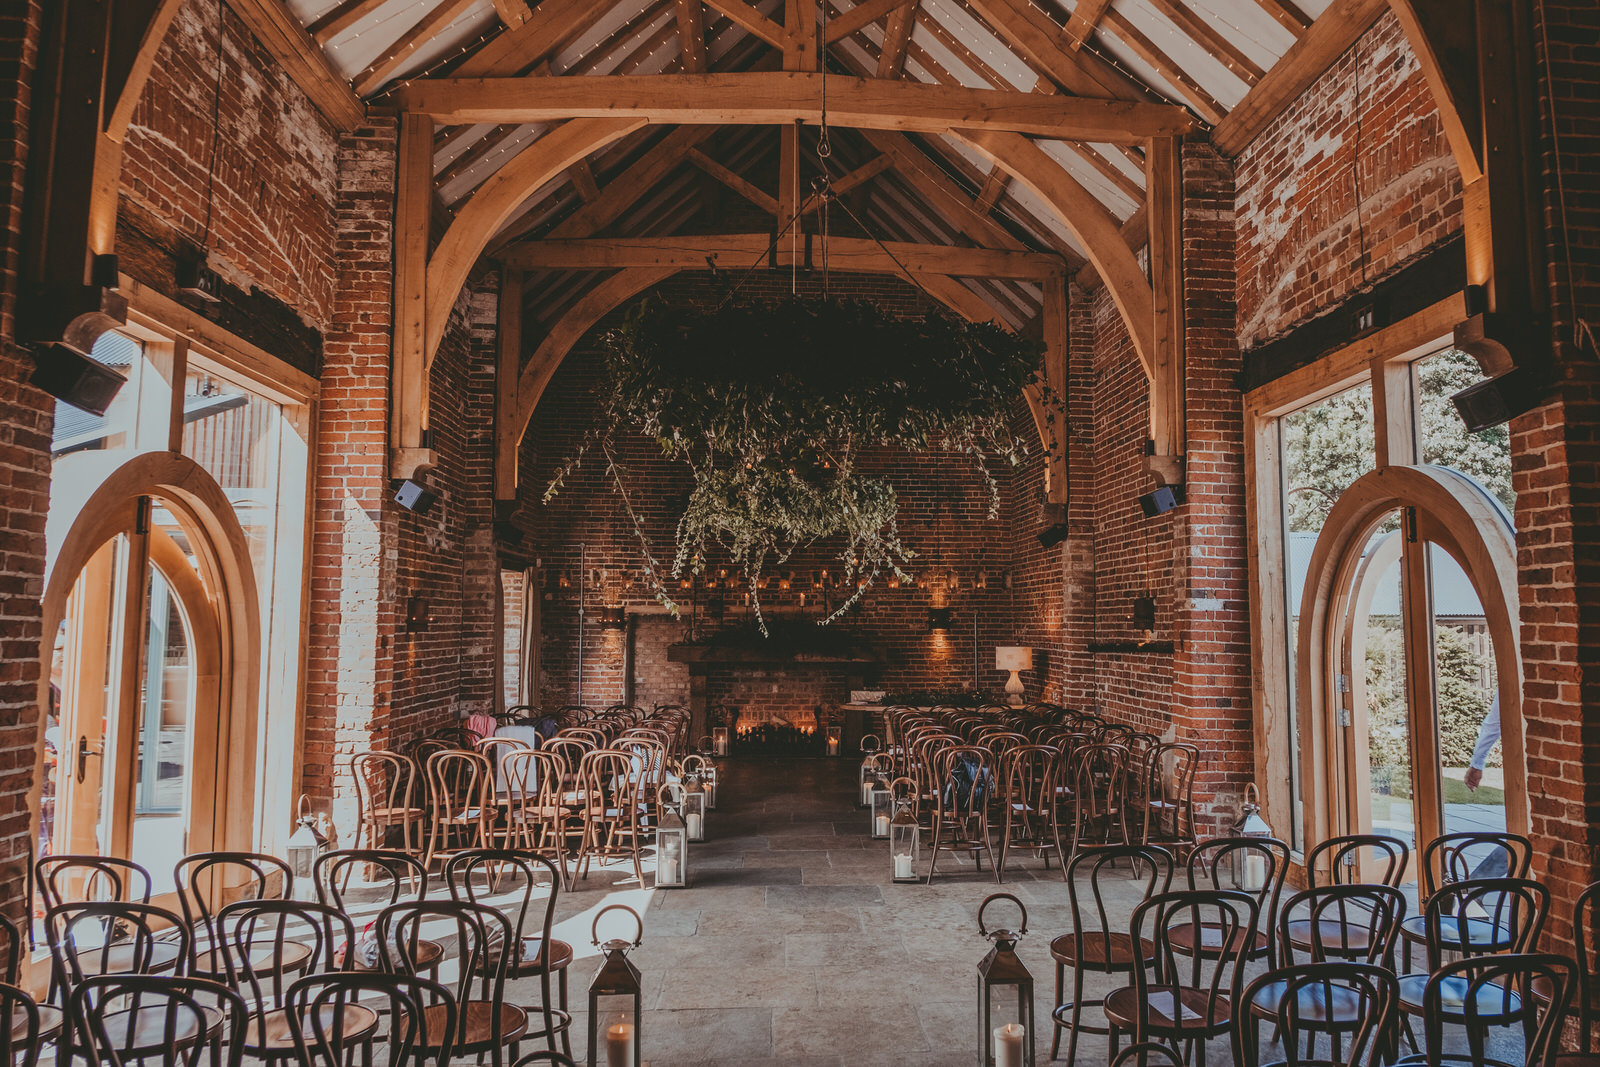 Hazel Gap Barn -Chris Snowden Photography - Summer 2018 - Alex & Harrison (129)hazel+gap+nottinghamshire+wedding+venue.jpg